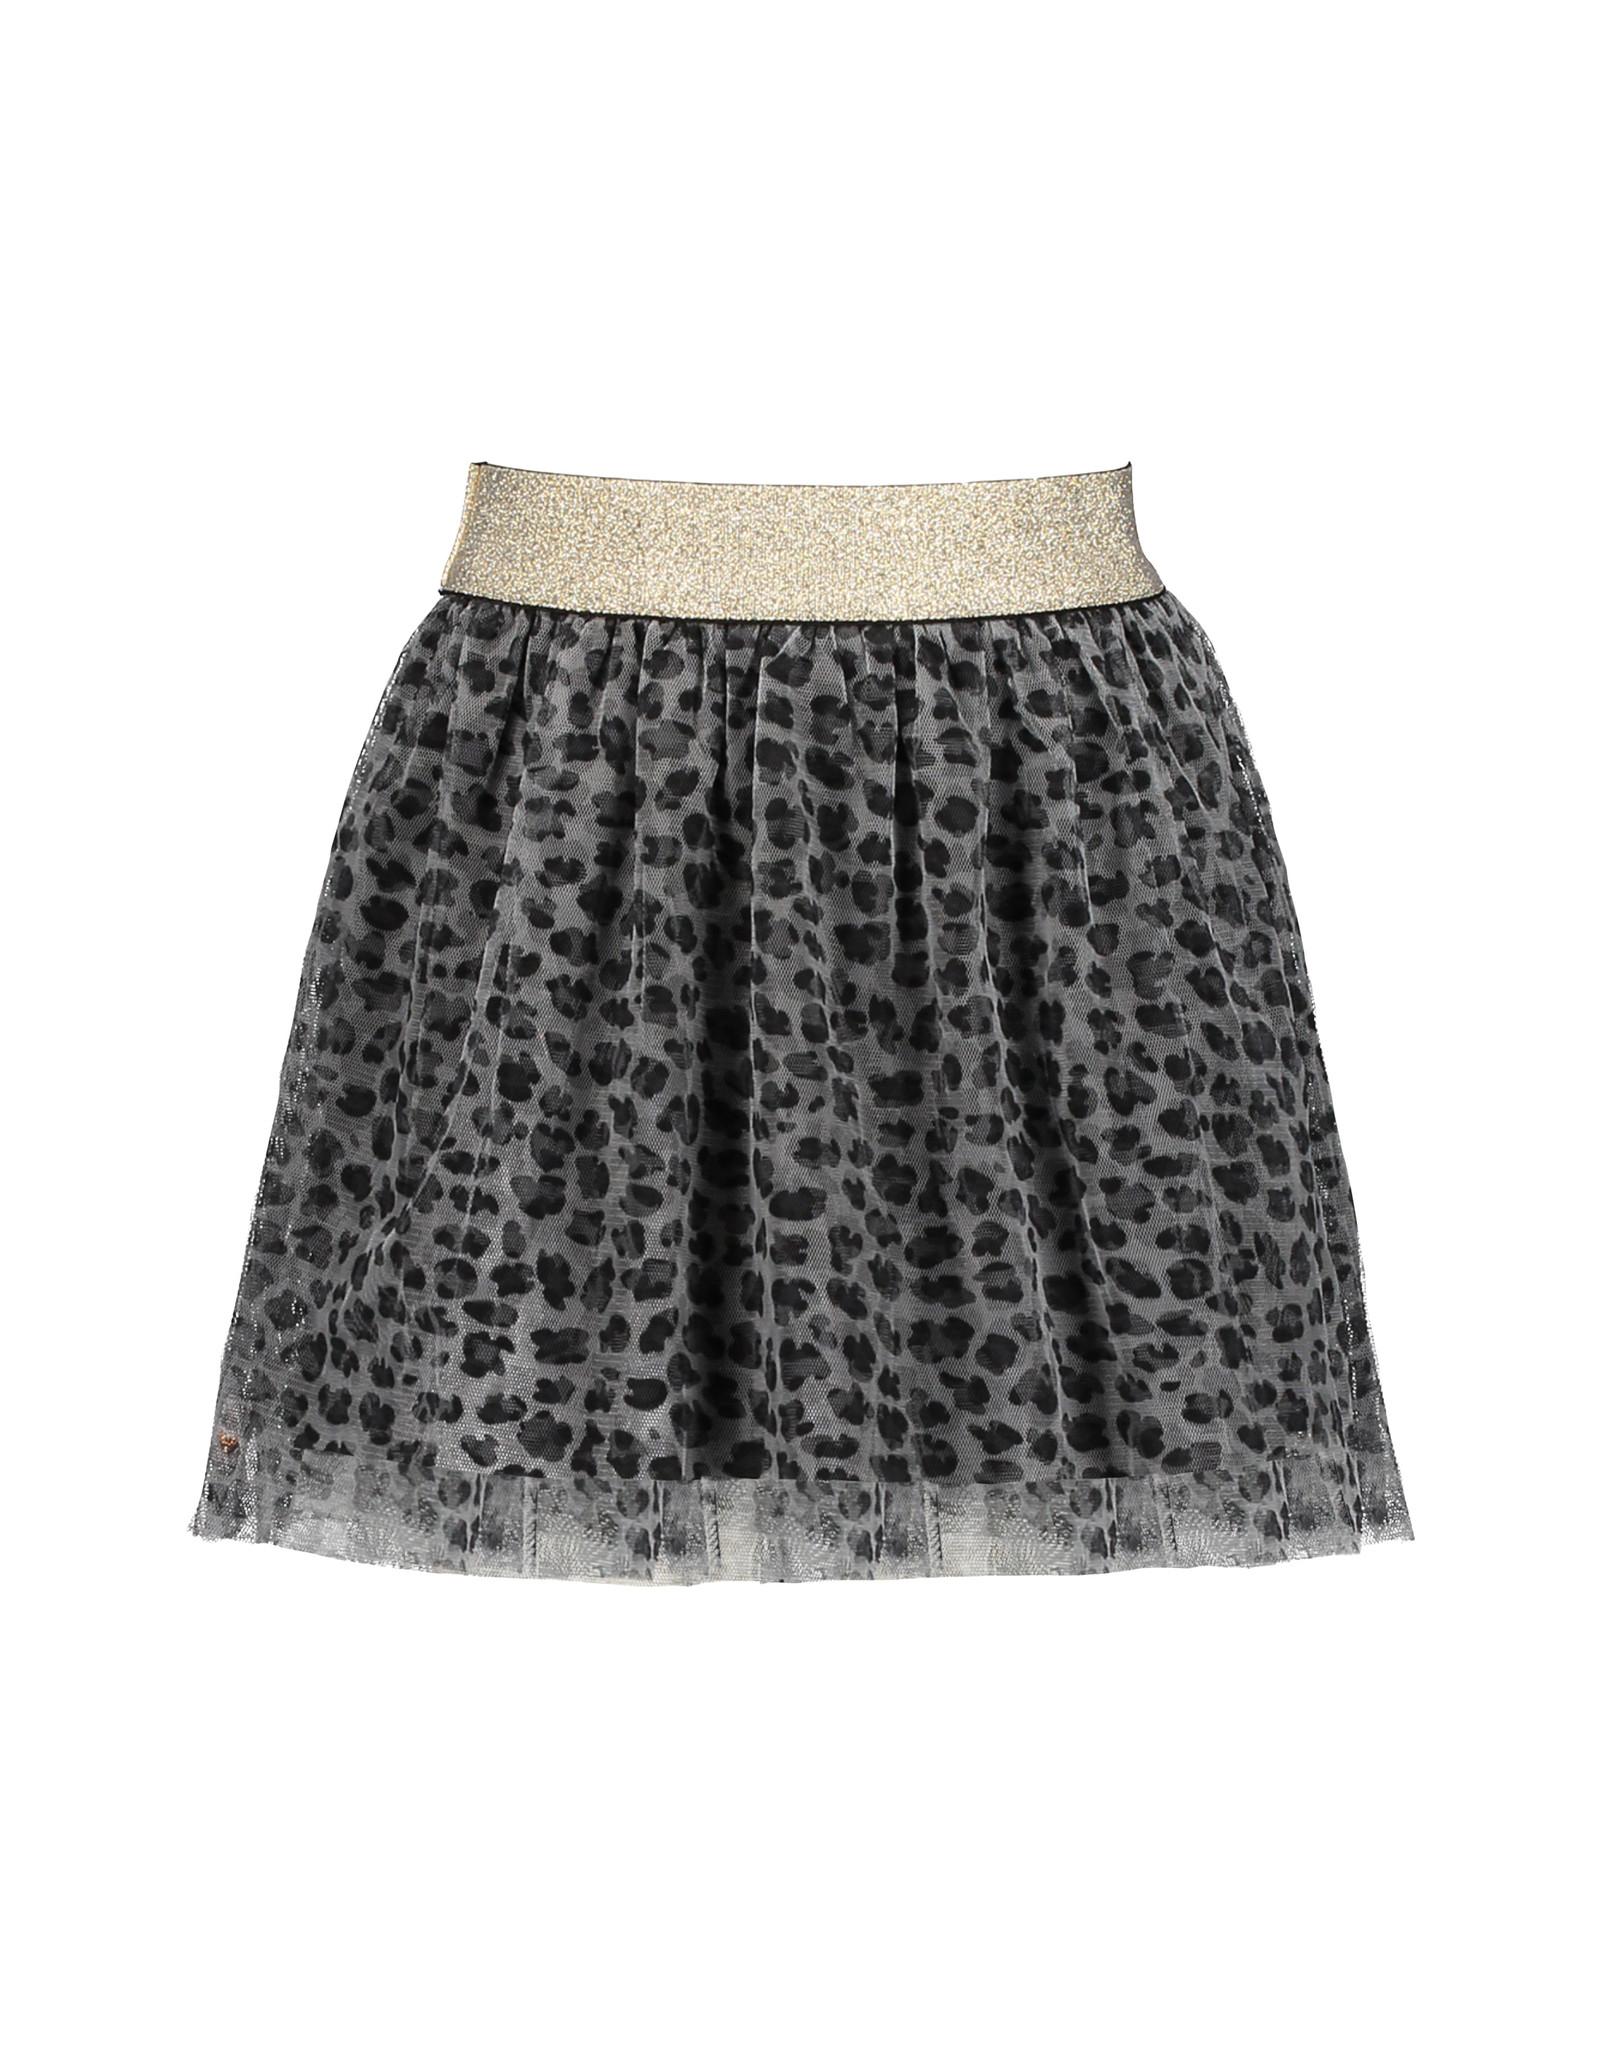 Moodstreet Moodstreet tulle skirt 5761 grey